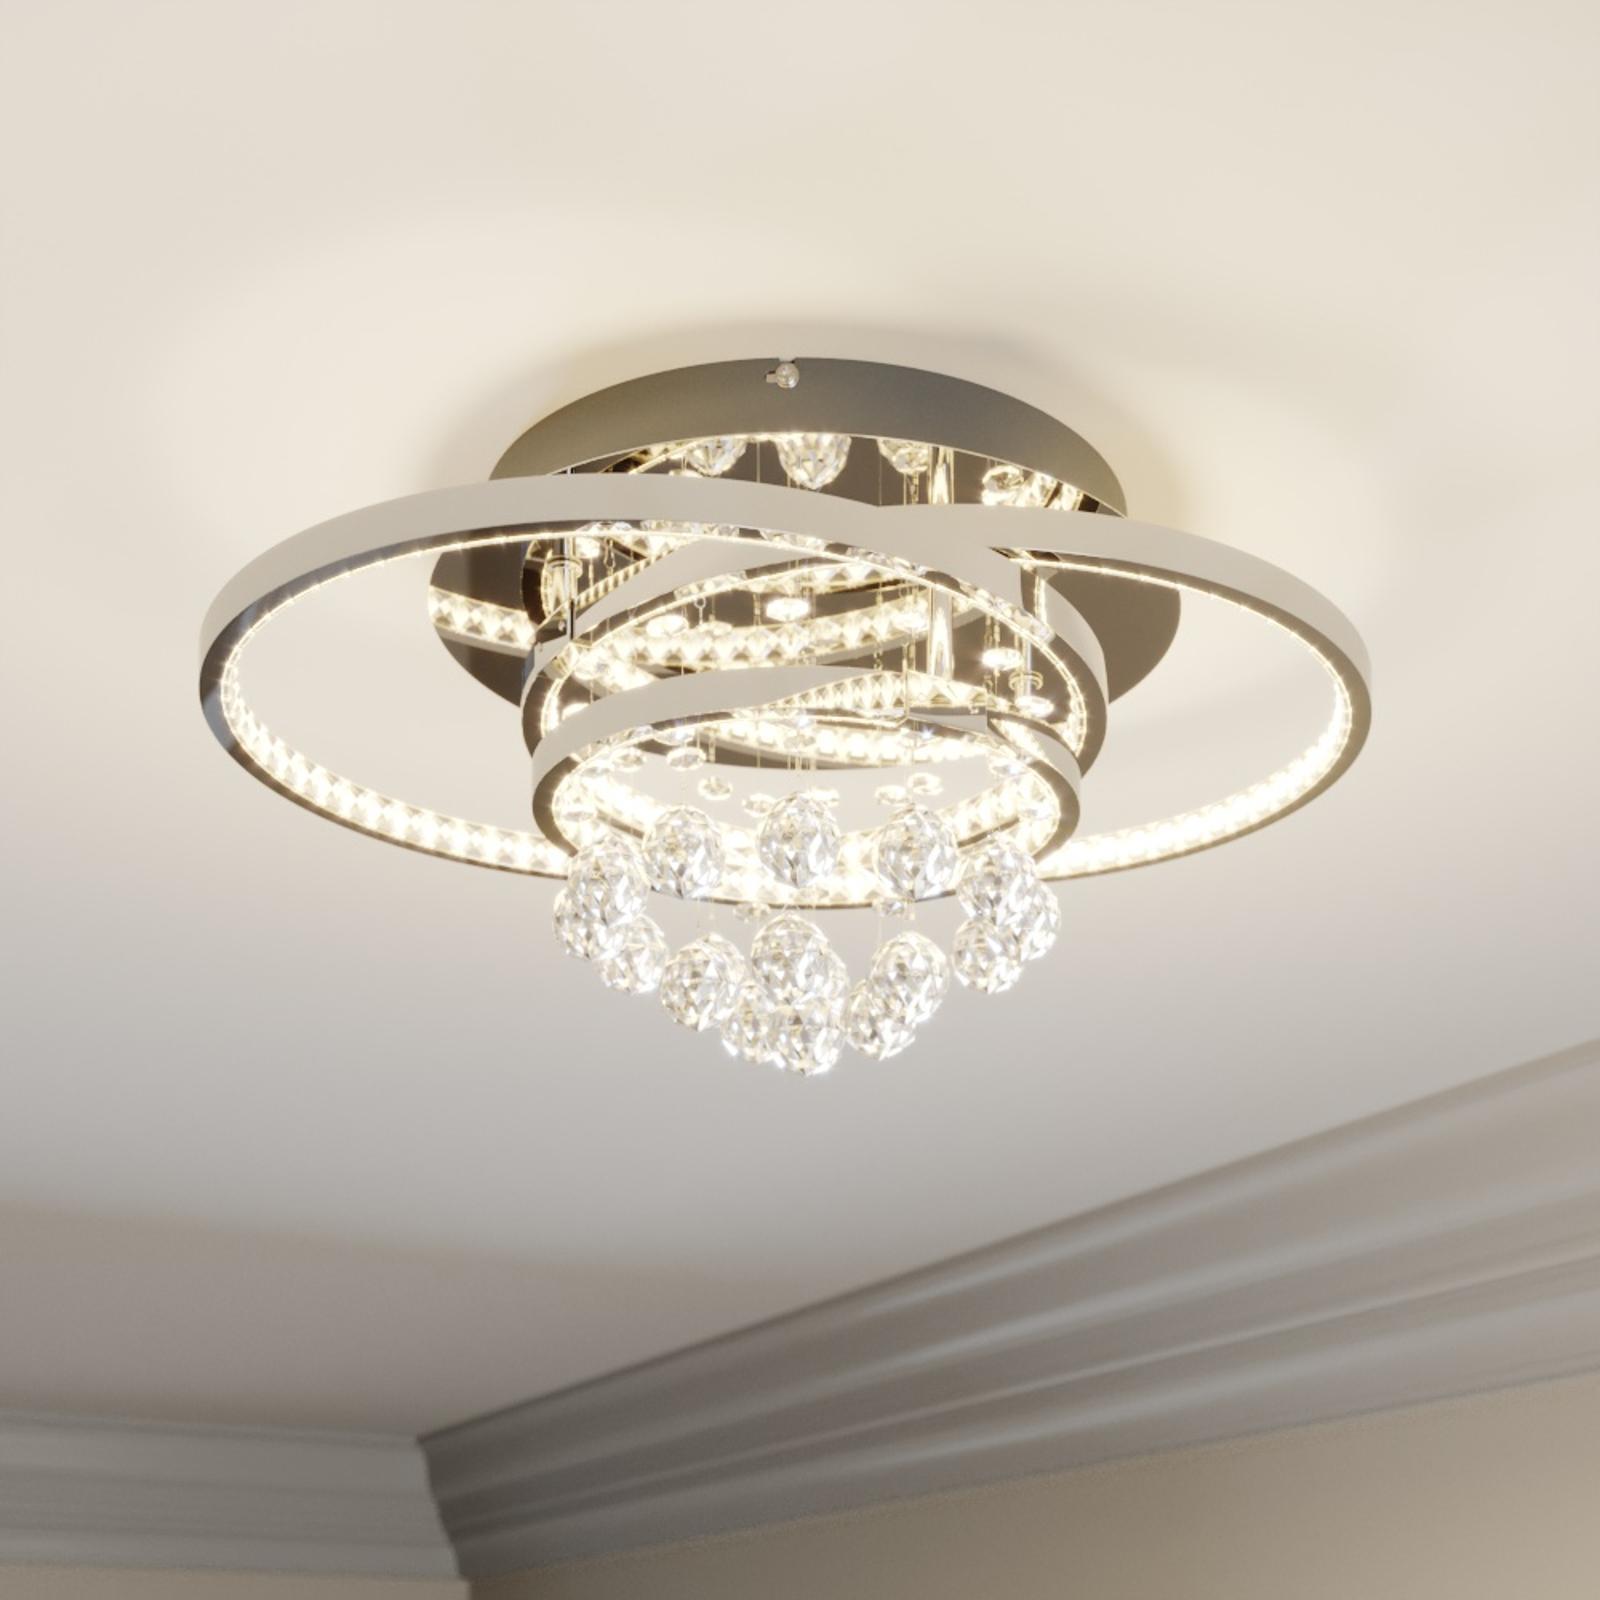 Lucande Keely lampa sufitowa LED kryształ, 44,5 cm